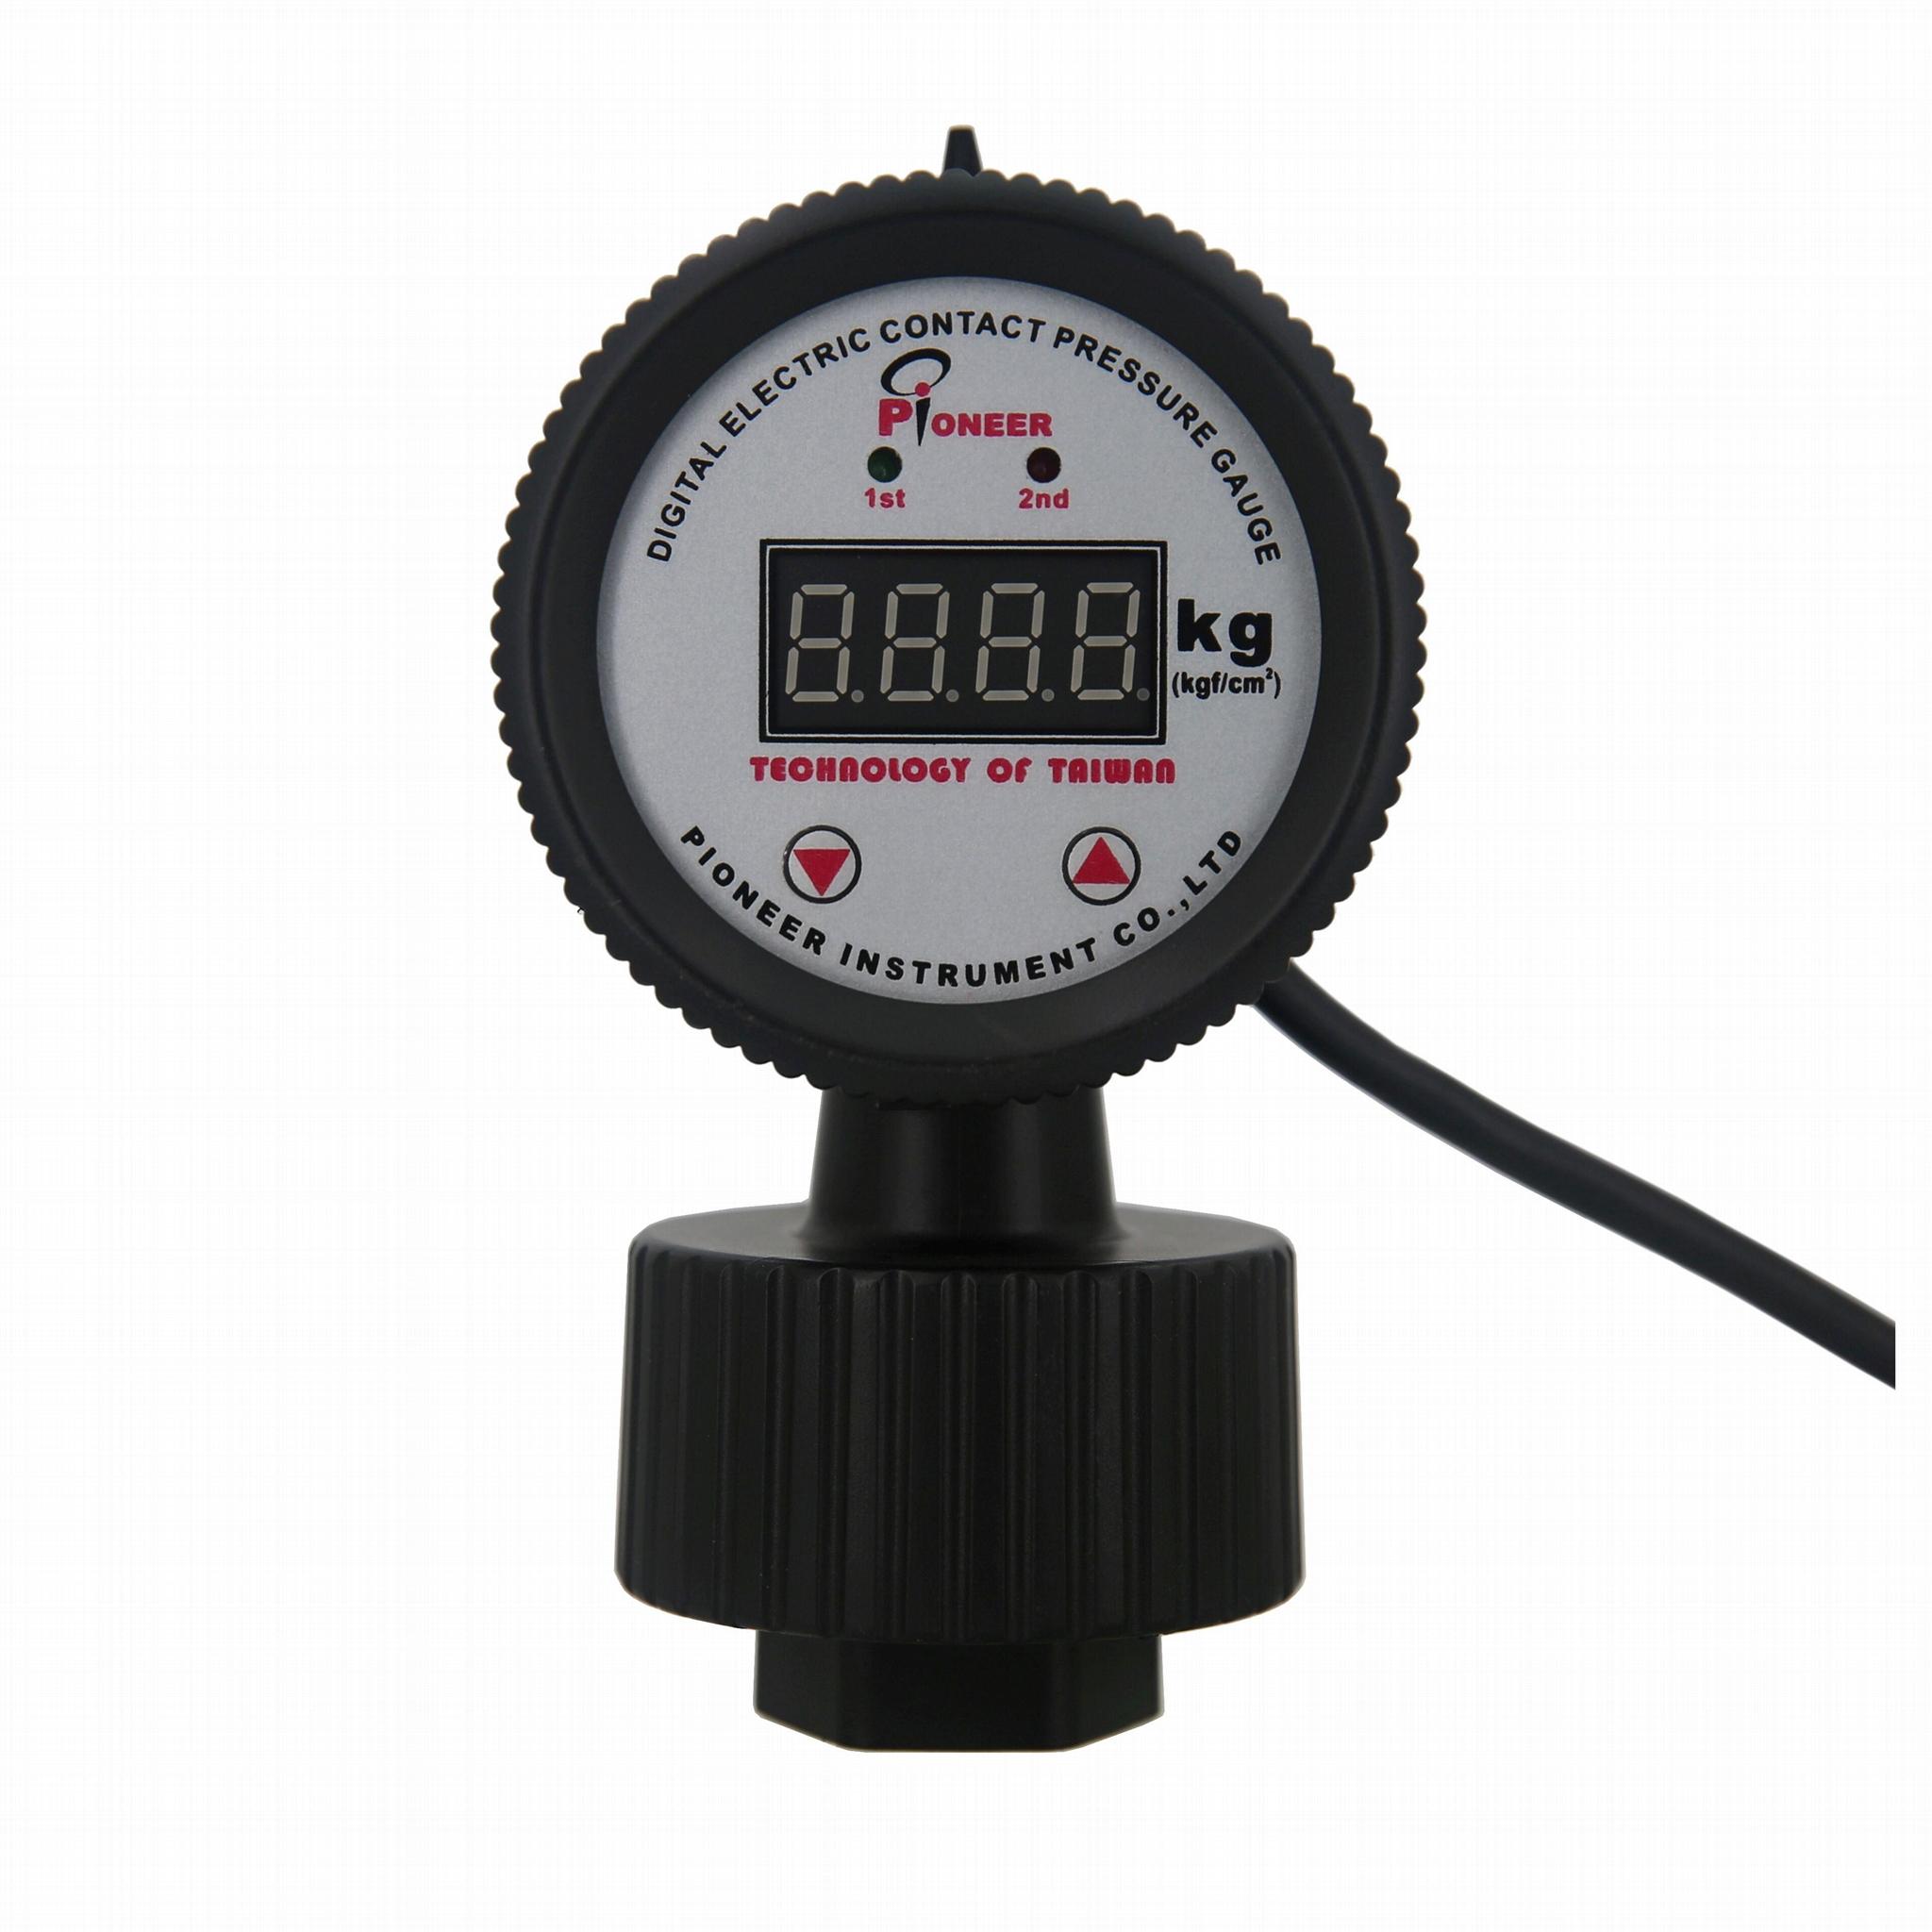 PP digital display electric contact diaphragm pressure gauge